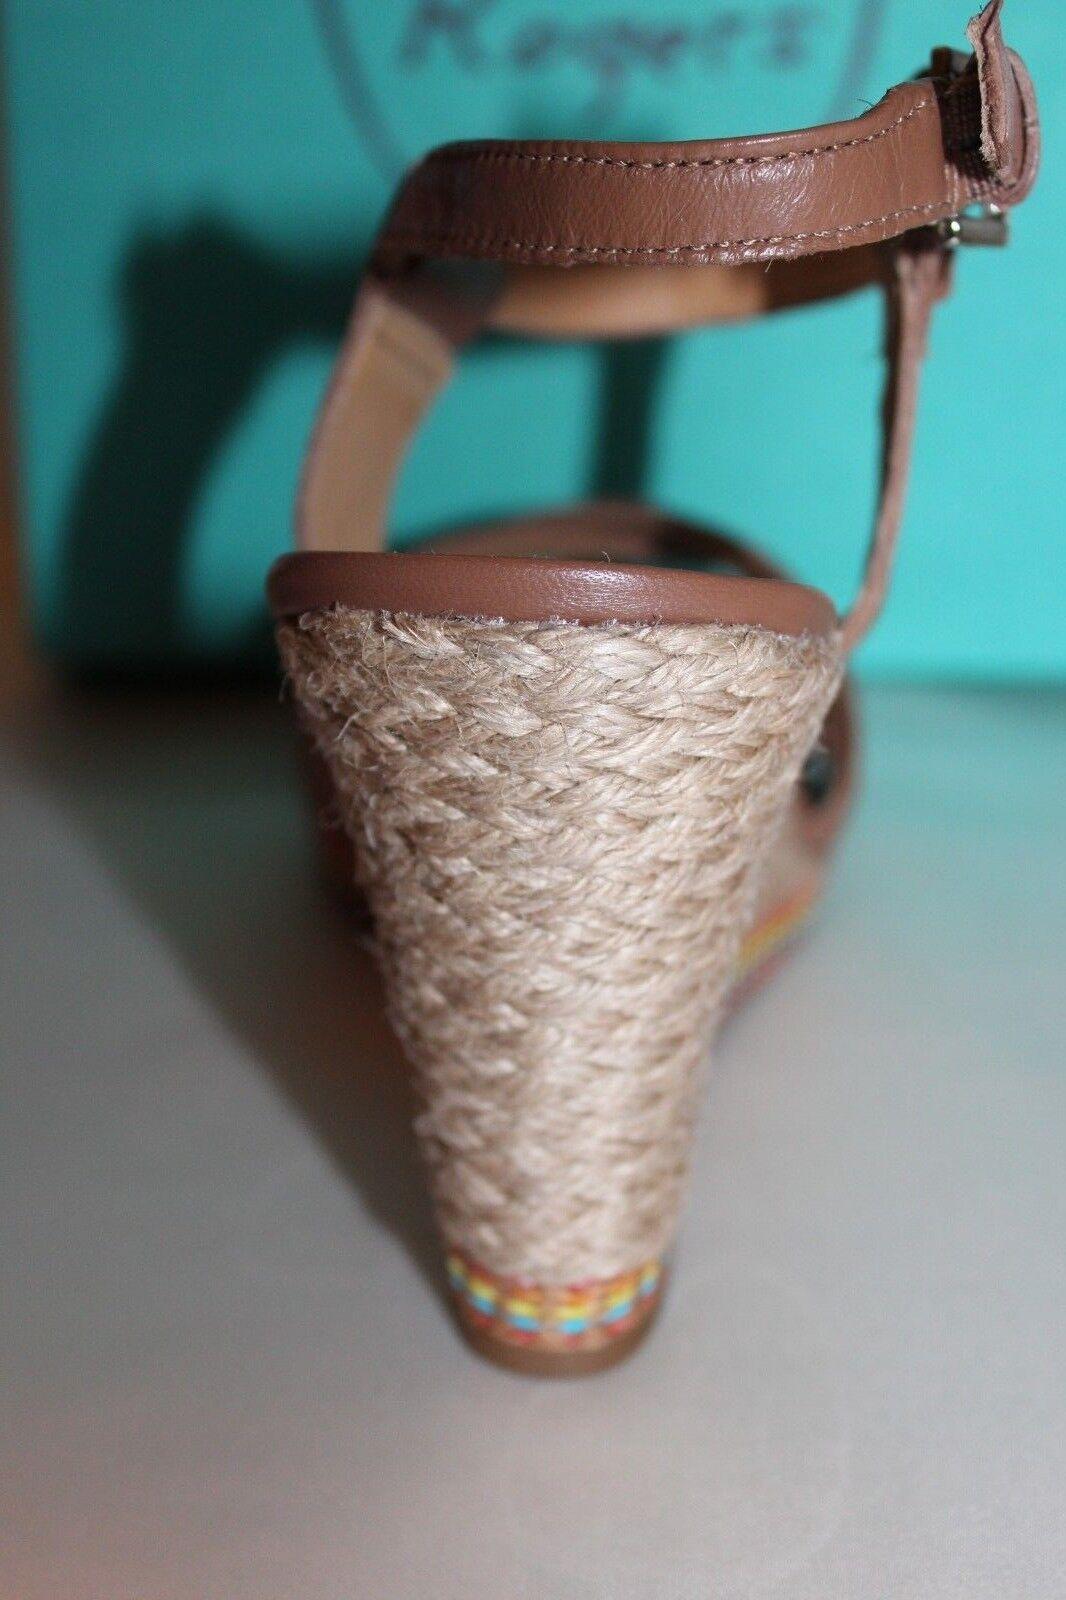 NEW  NIB NIB   JACK ROGERS Cognac Braun Leder ABBEY Jute Wedge Sandale Sz 10 188 e801a7